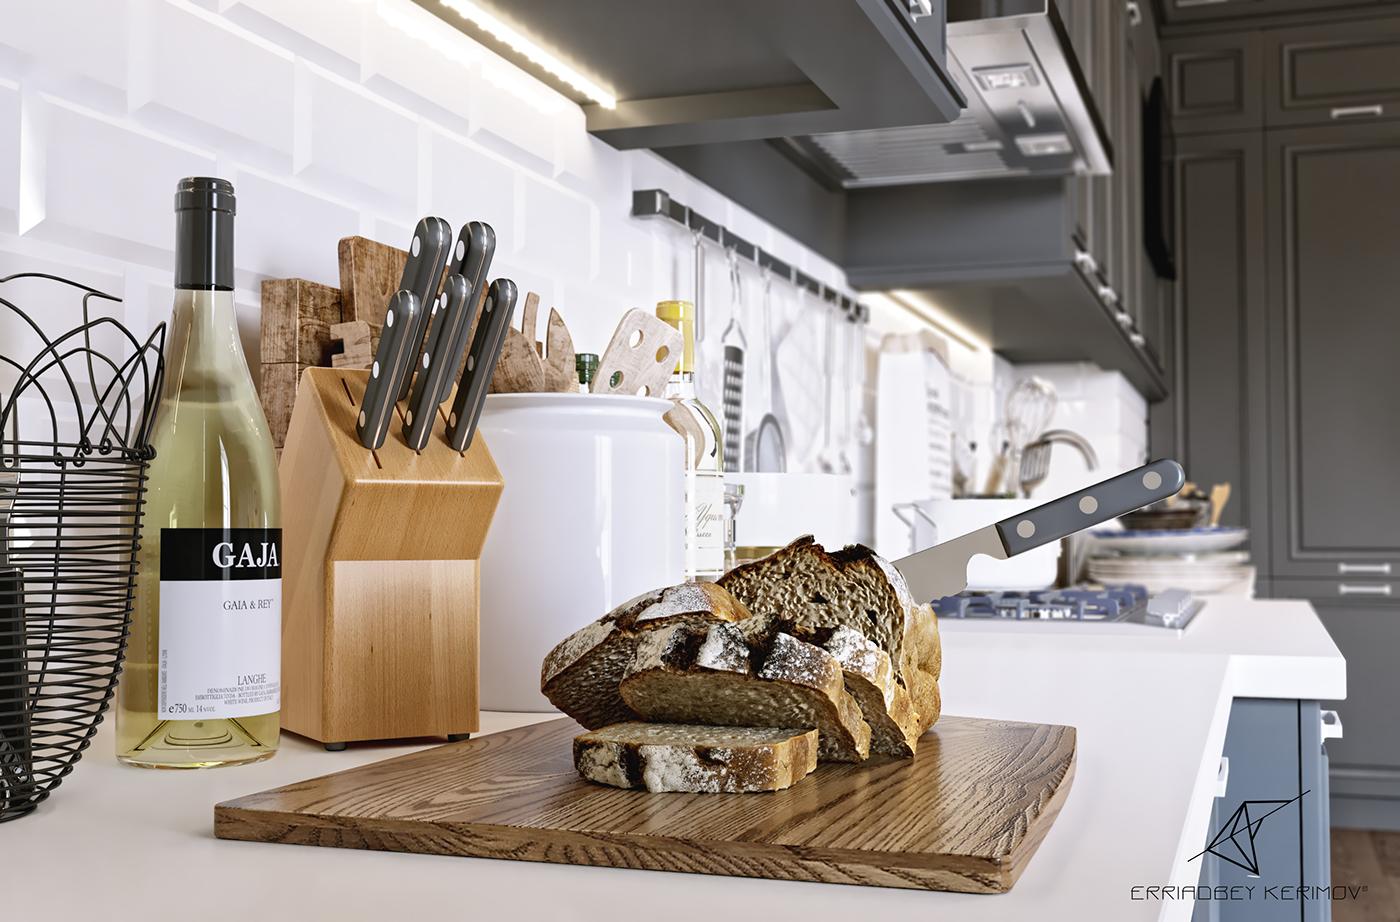 Neo Classic Kitchen on Behance